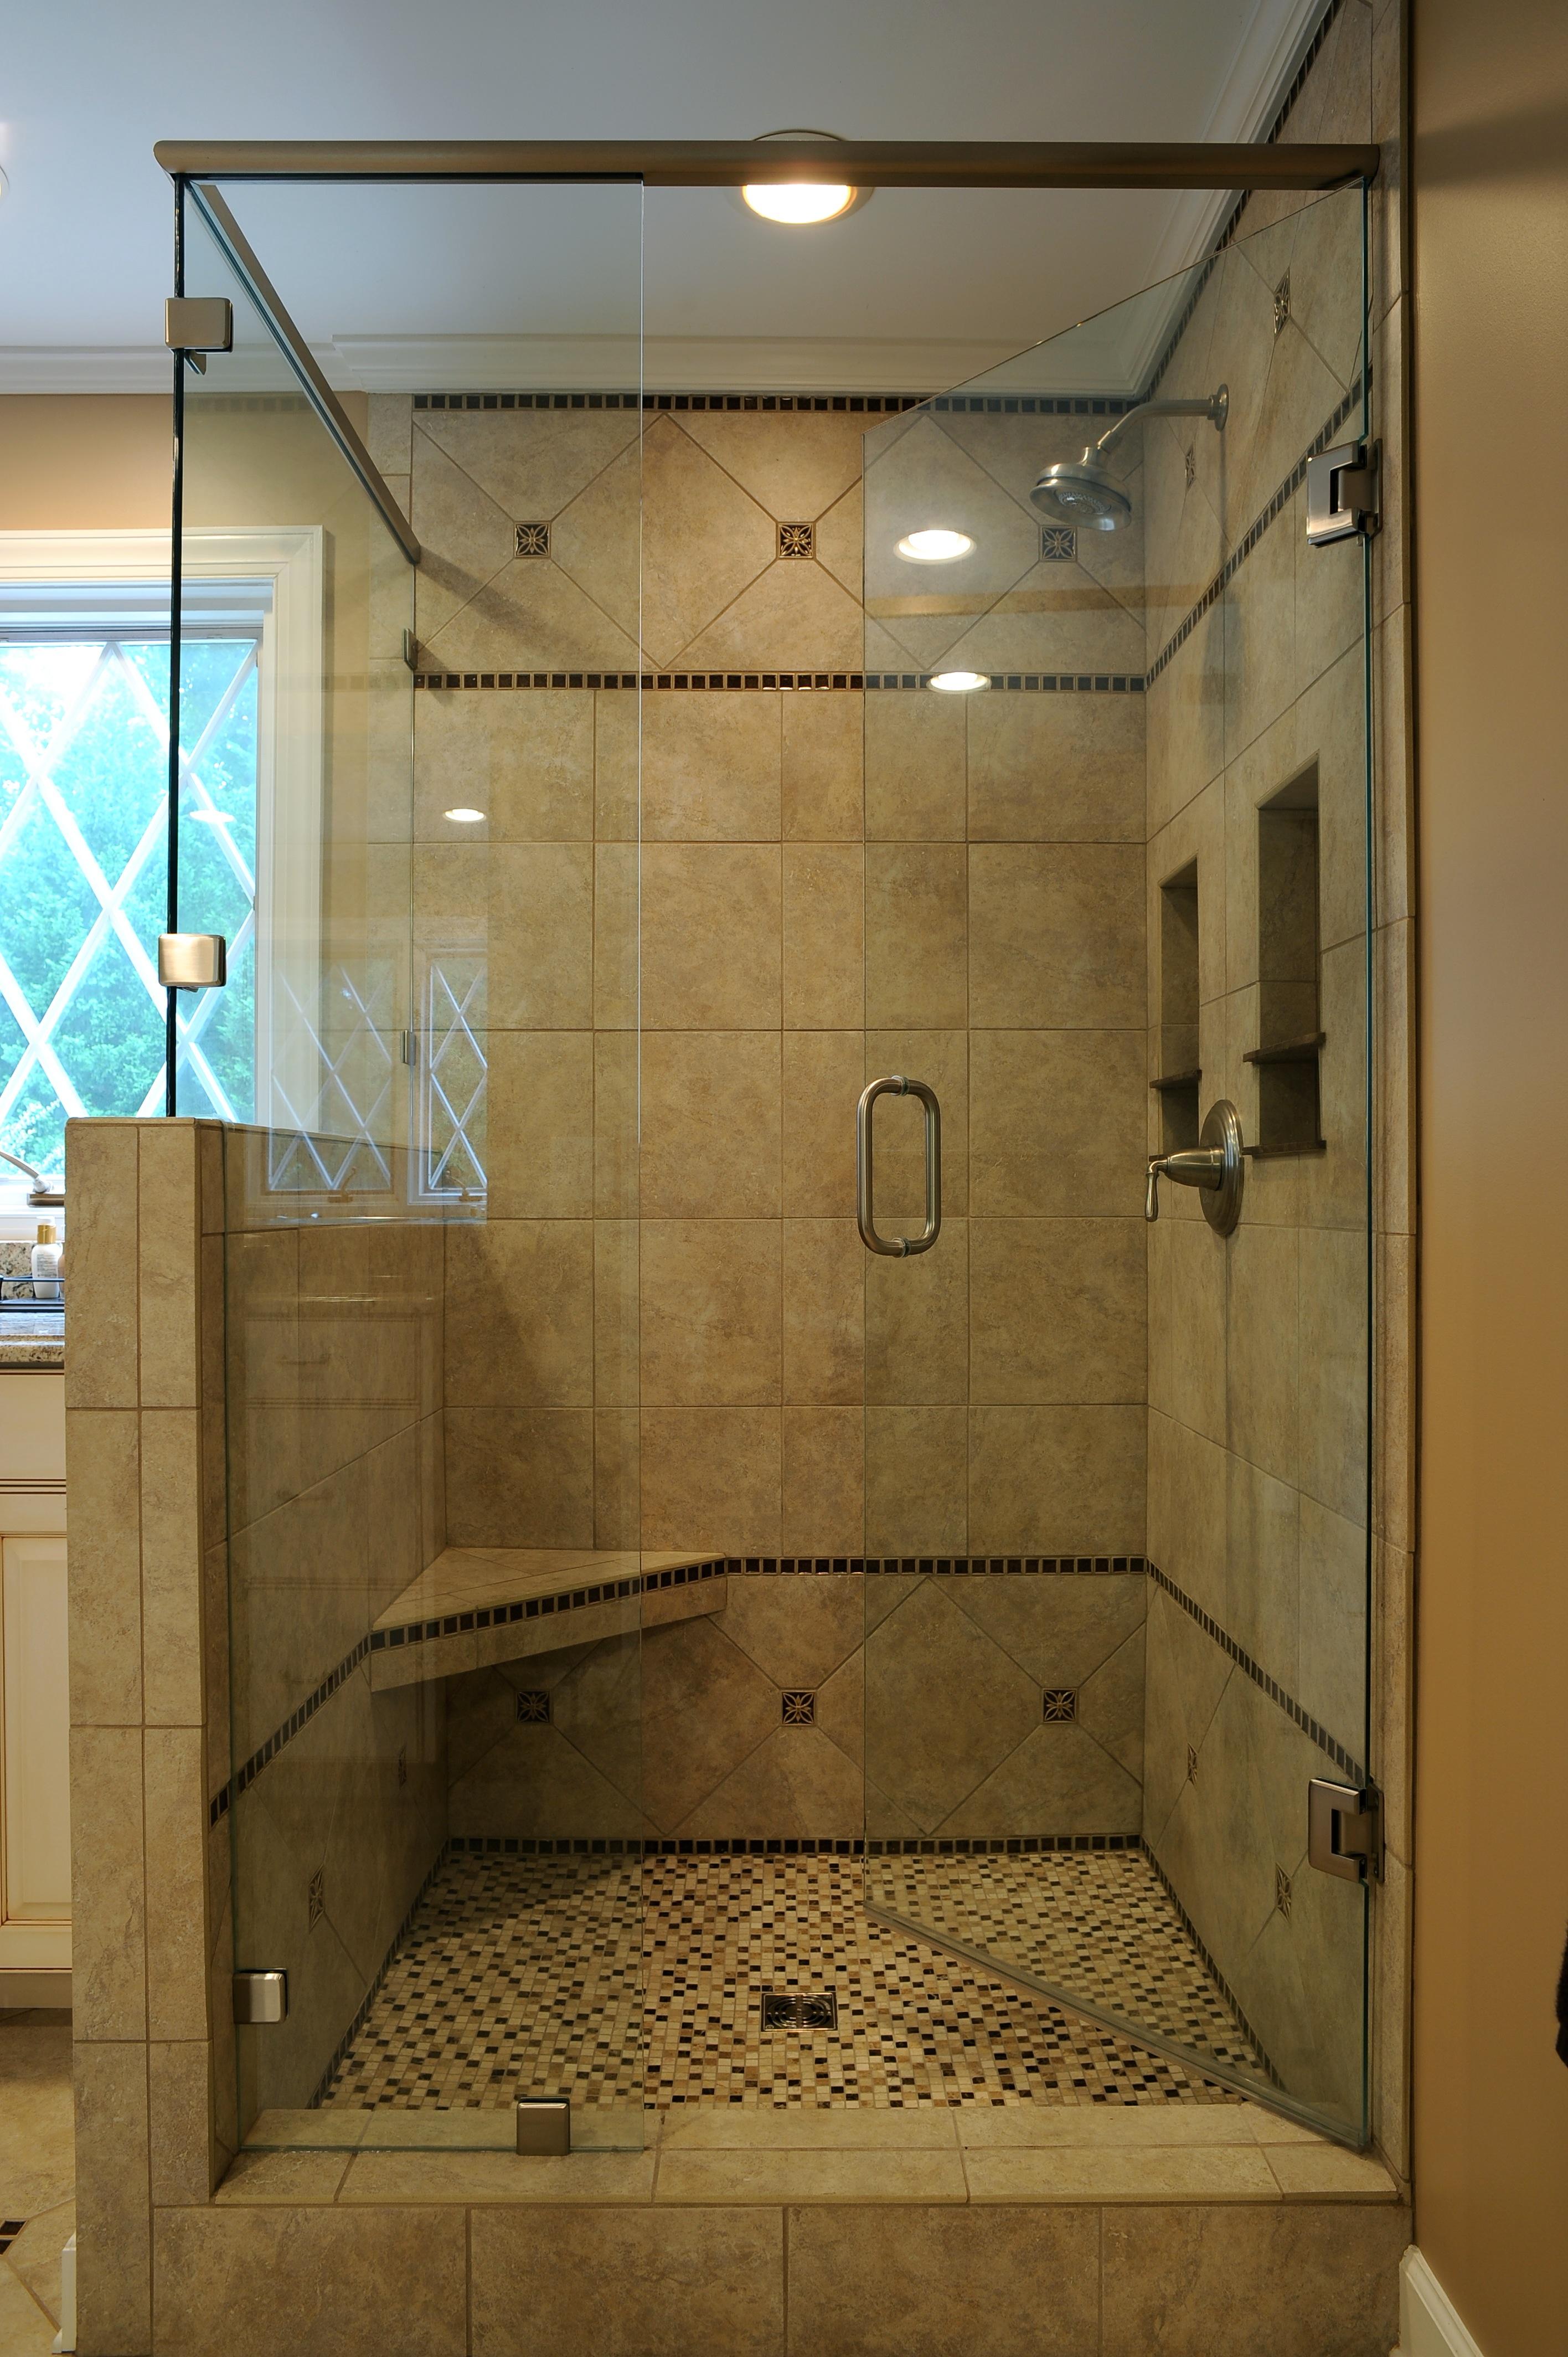 Baths | STEPHEN L. MABE BUILDING, INC.